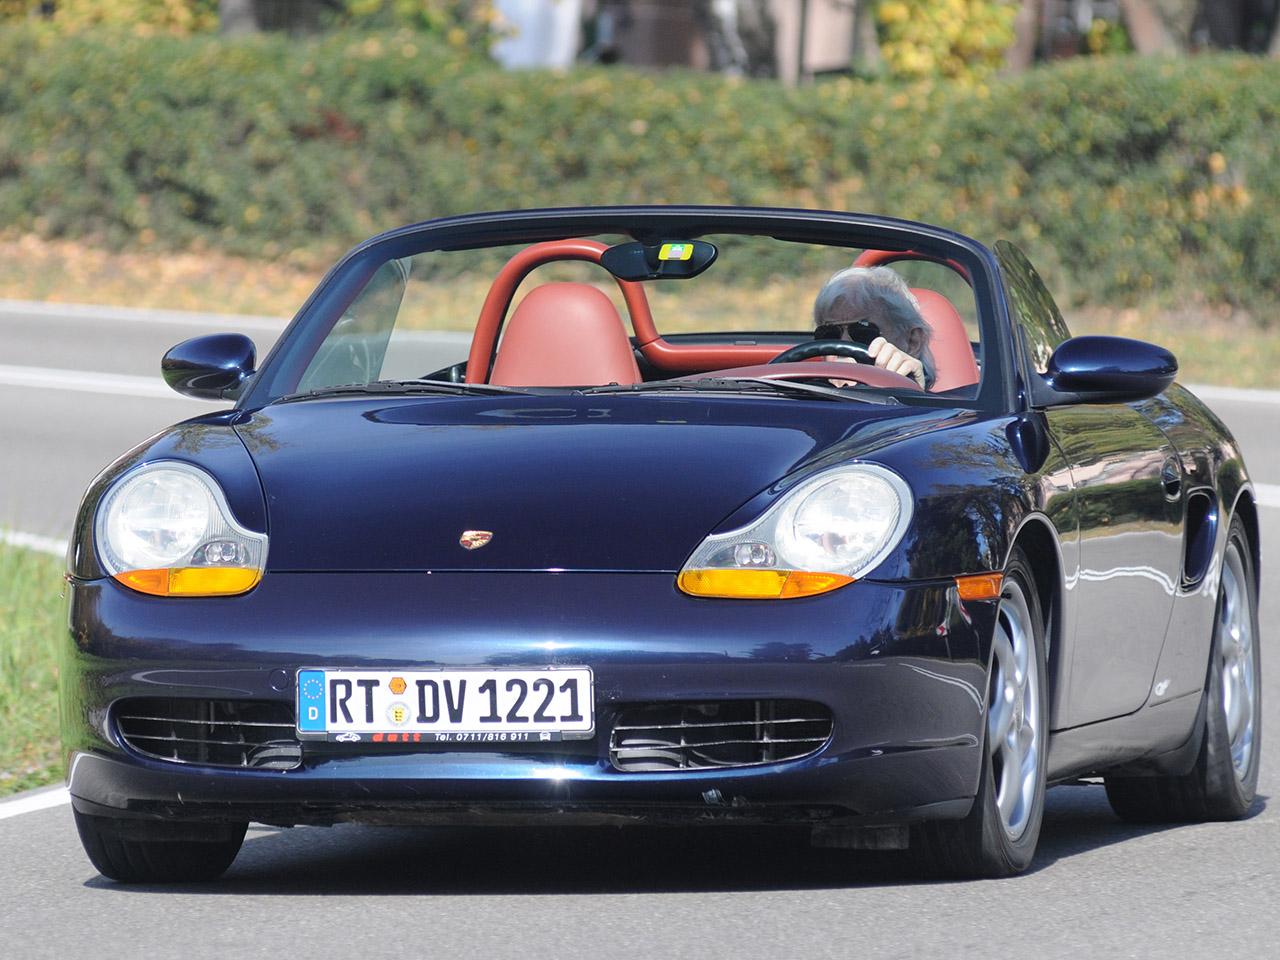 Porsche Boxster 986 Gebrauchtwagen Test Autozeitung De